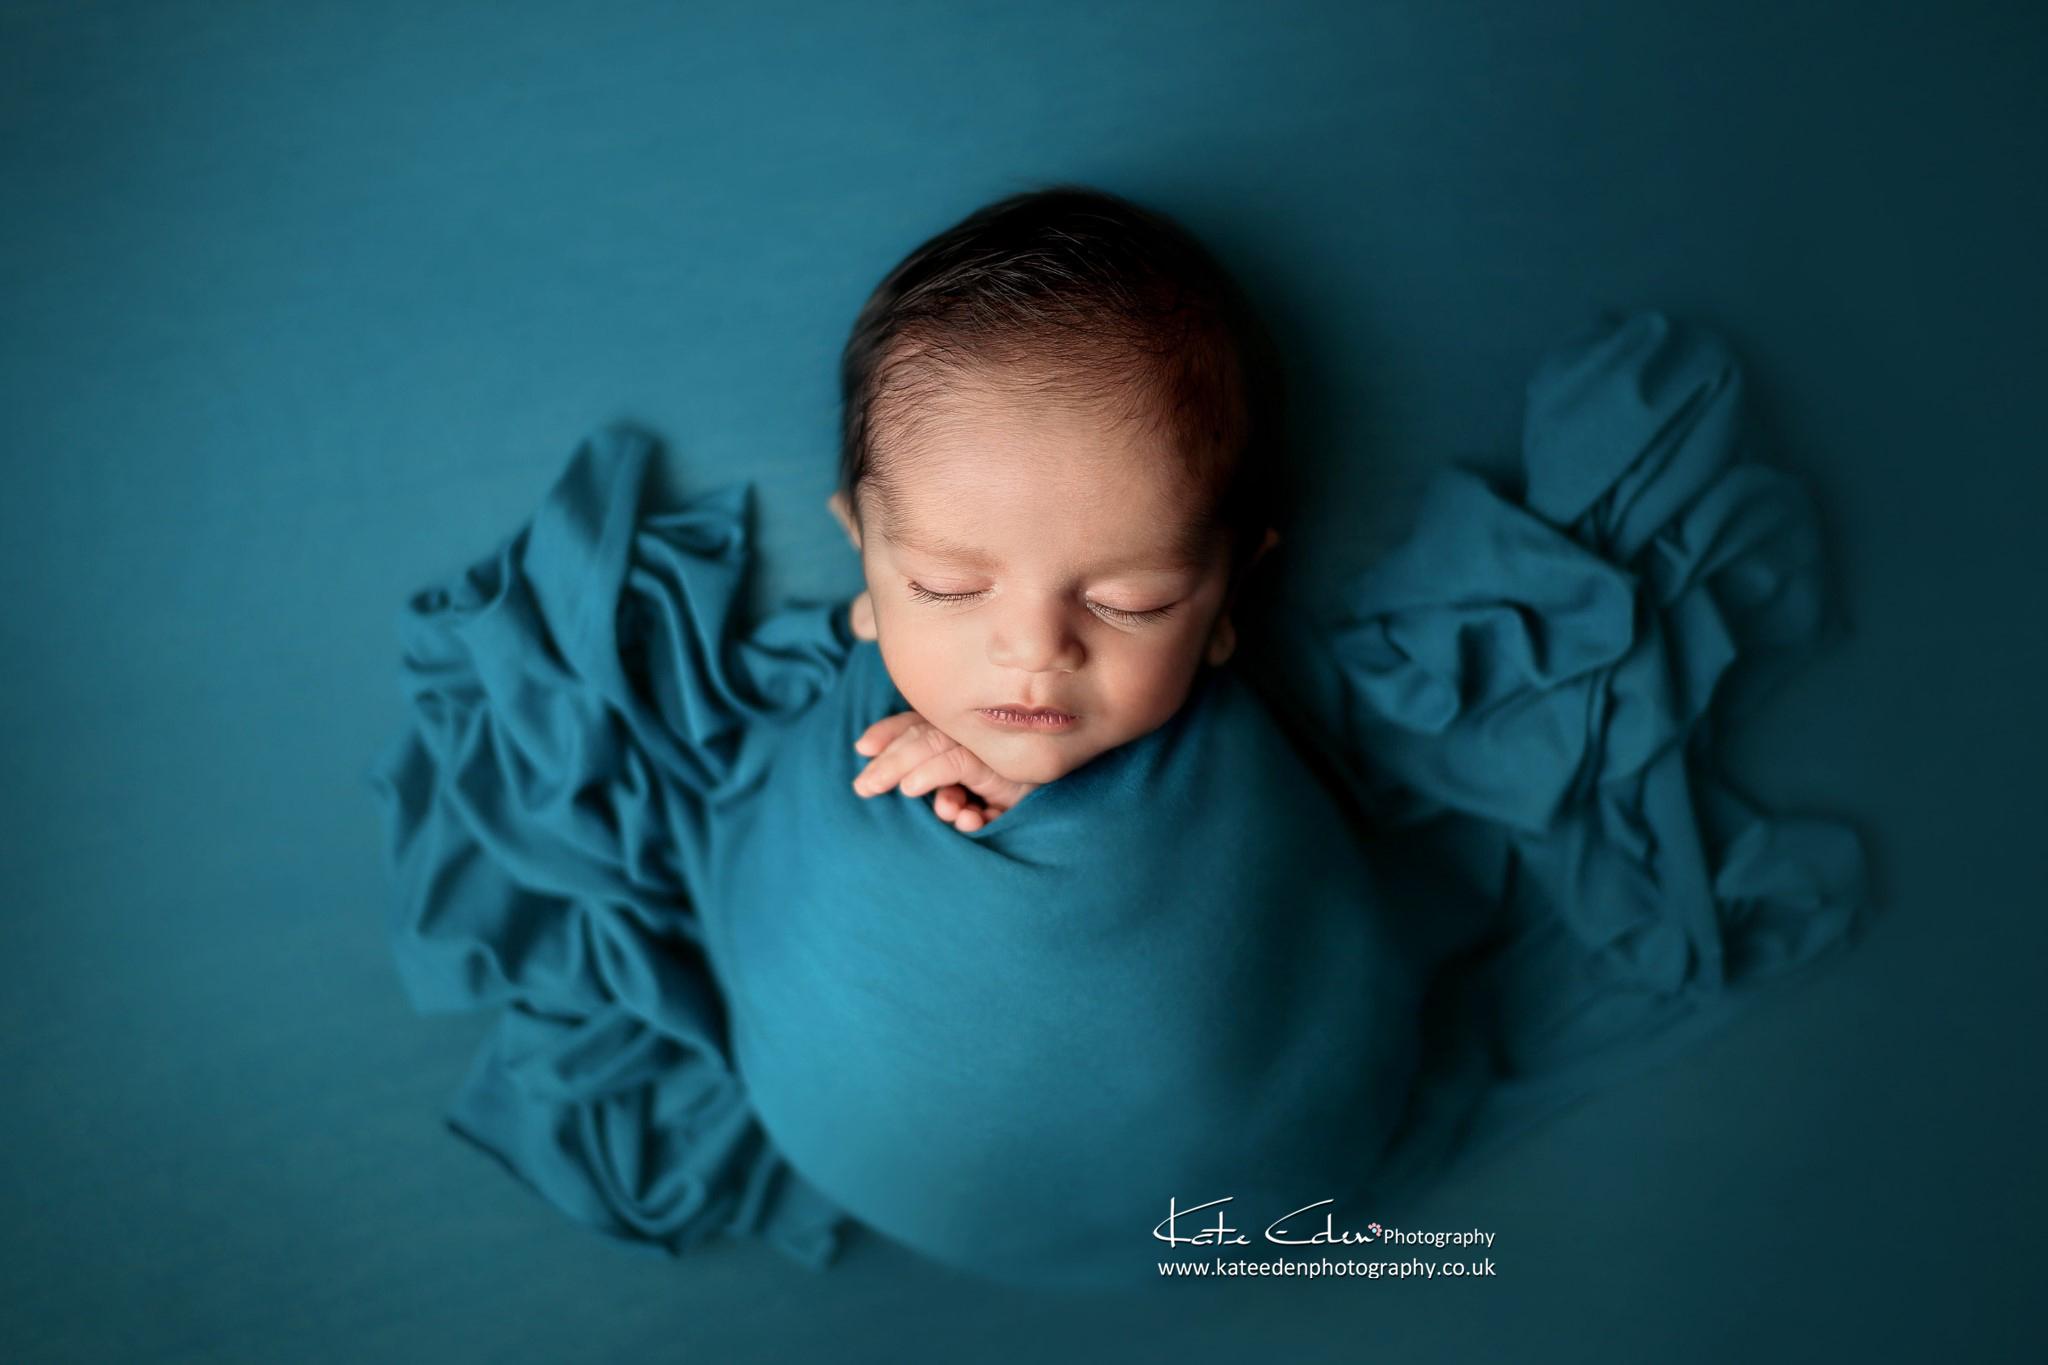 Newborn photoshoot in Milton Keynes - Kate Eden Photography